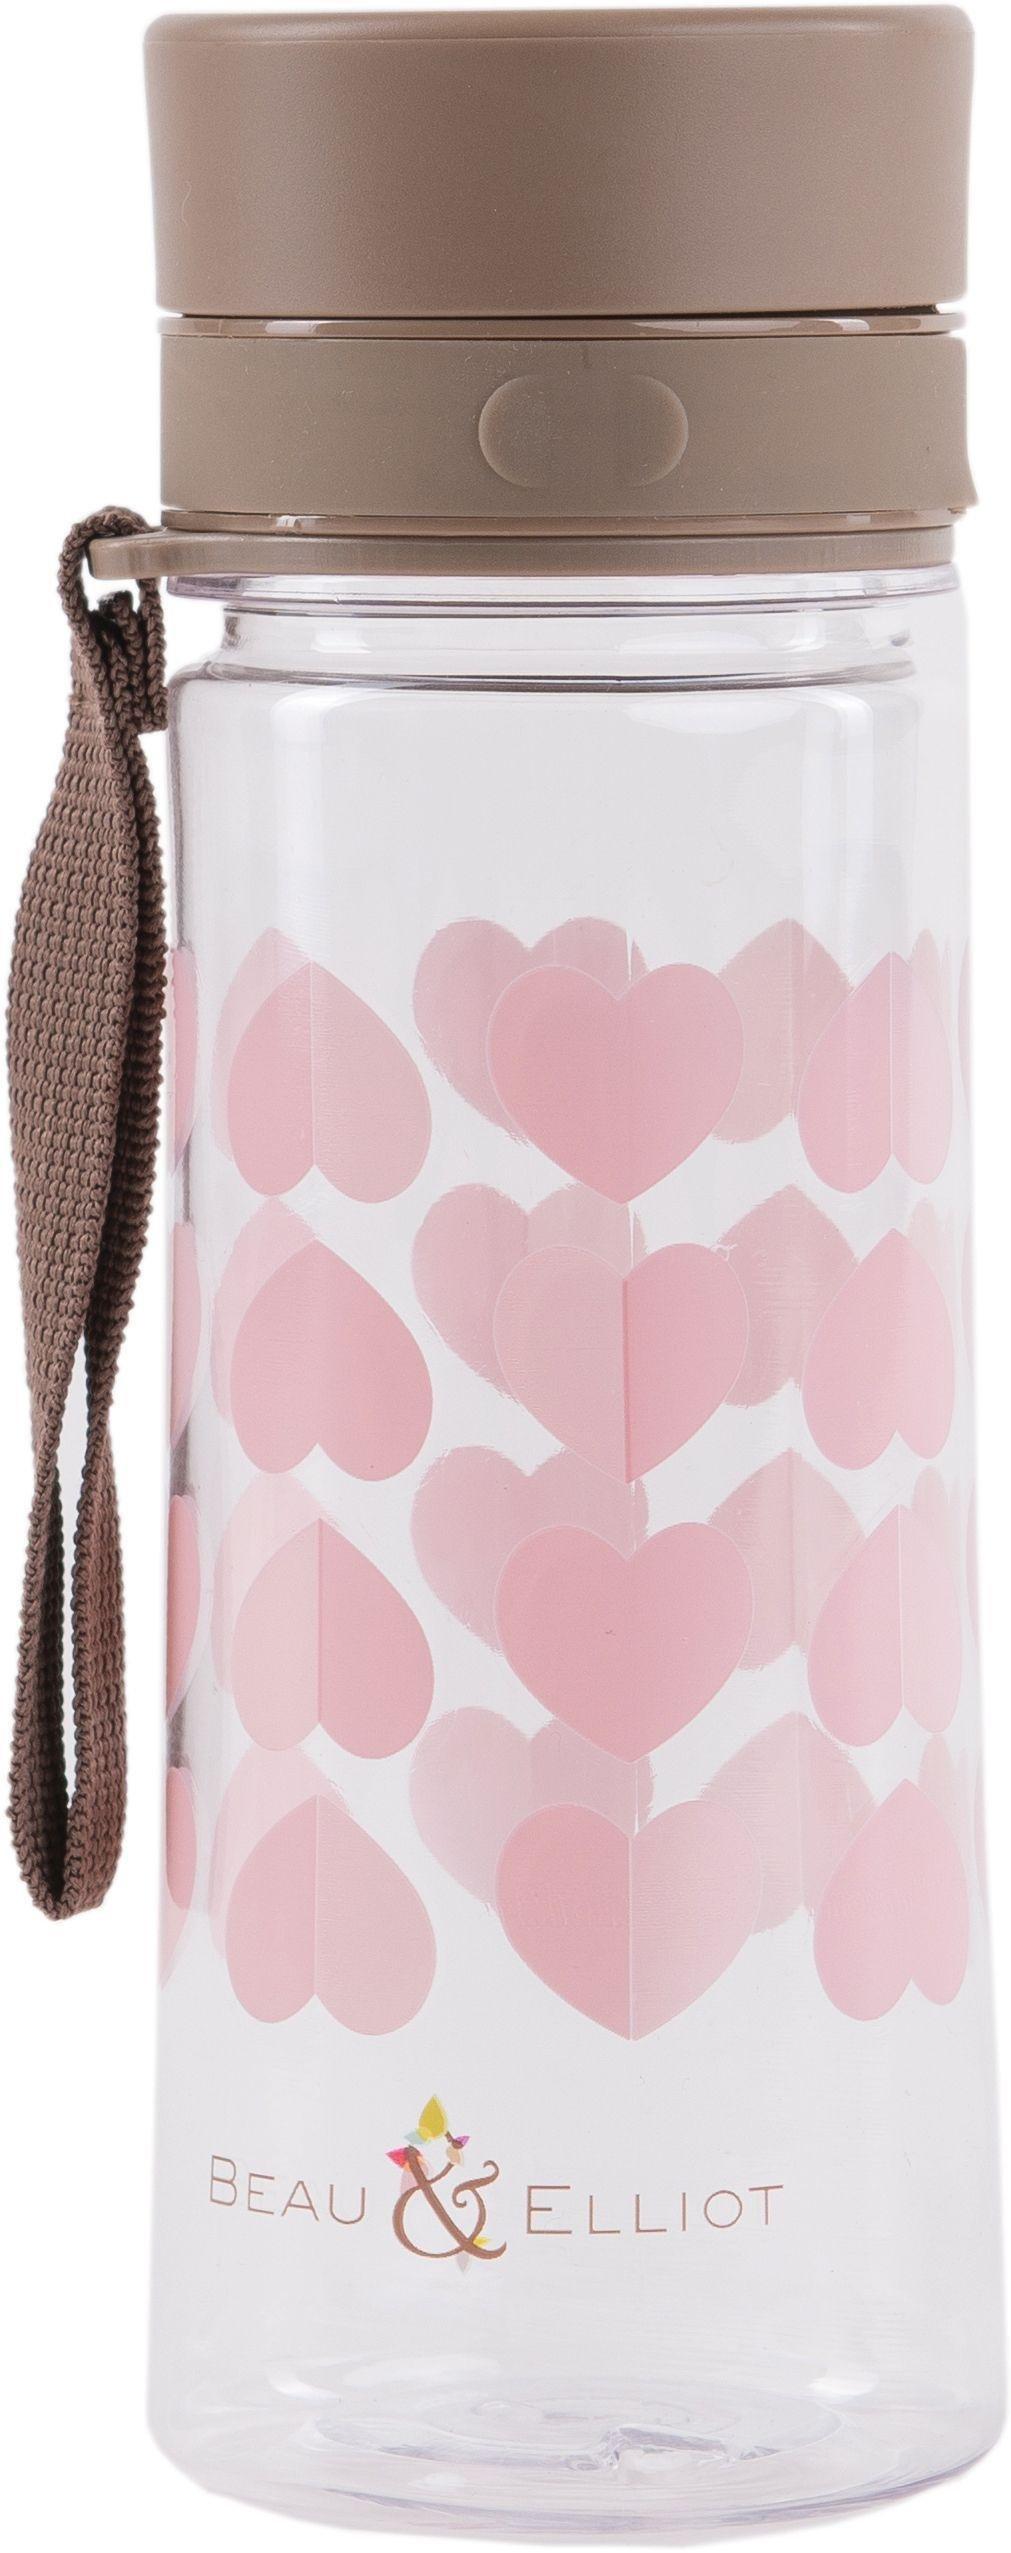 Image of Beau and Elliot - Confetti Hydration Bottle - Pink